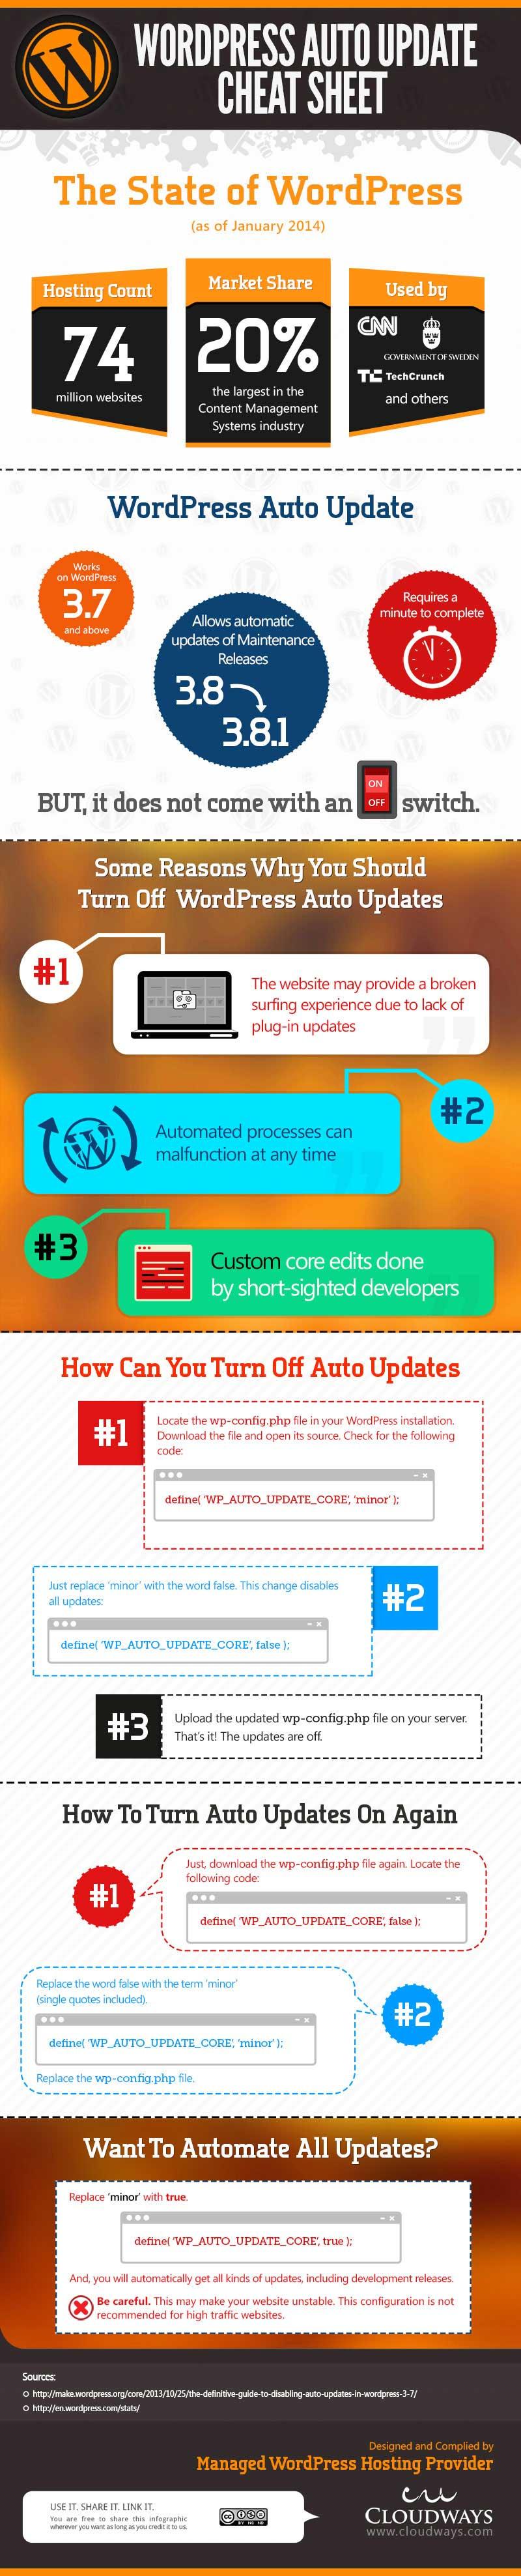 WordPress Auto Update Cheat Sheet